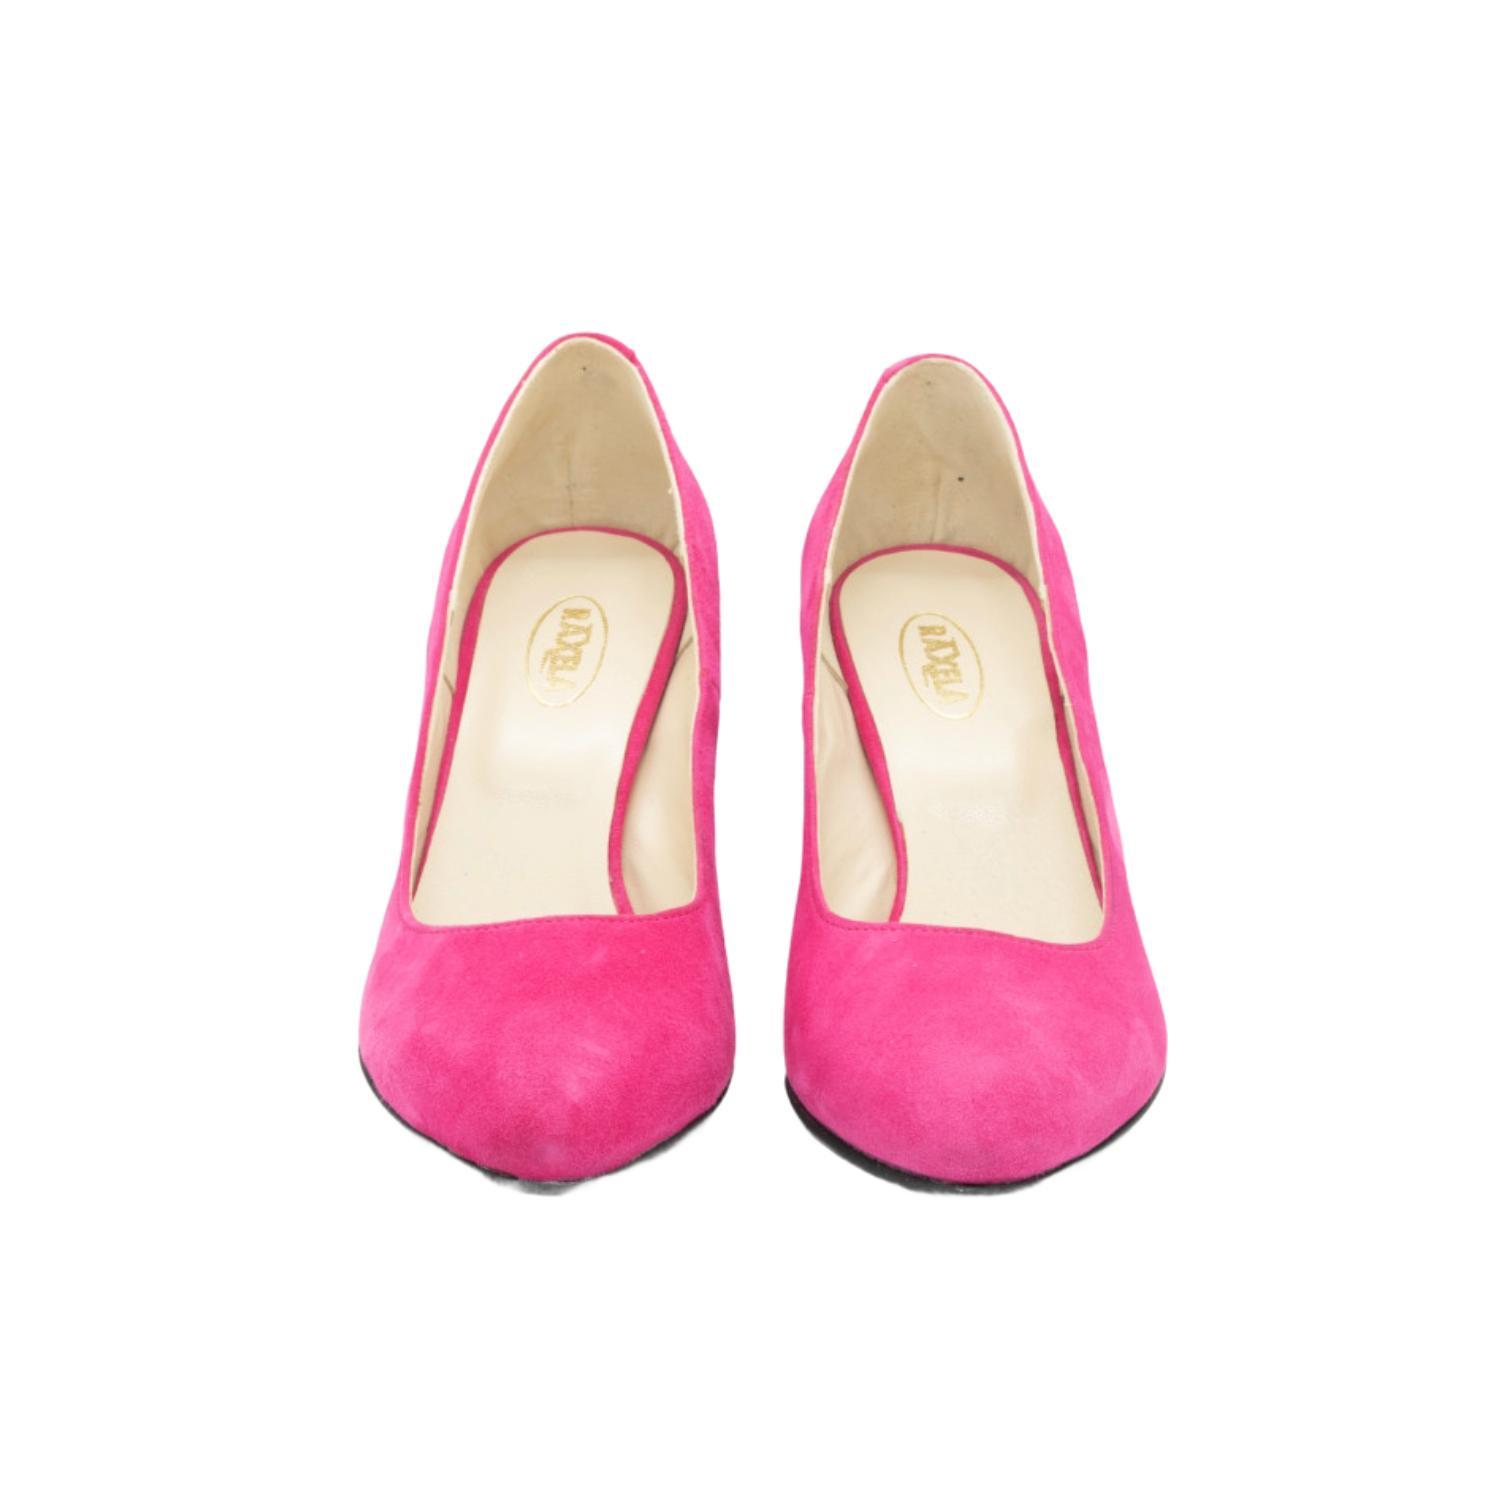 Pantofi fuchsia cu toc colorat